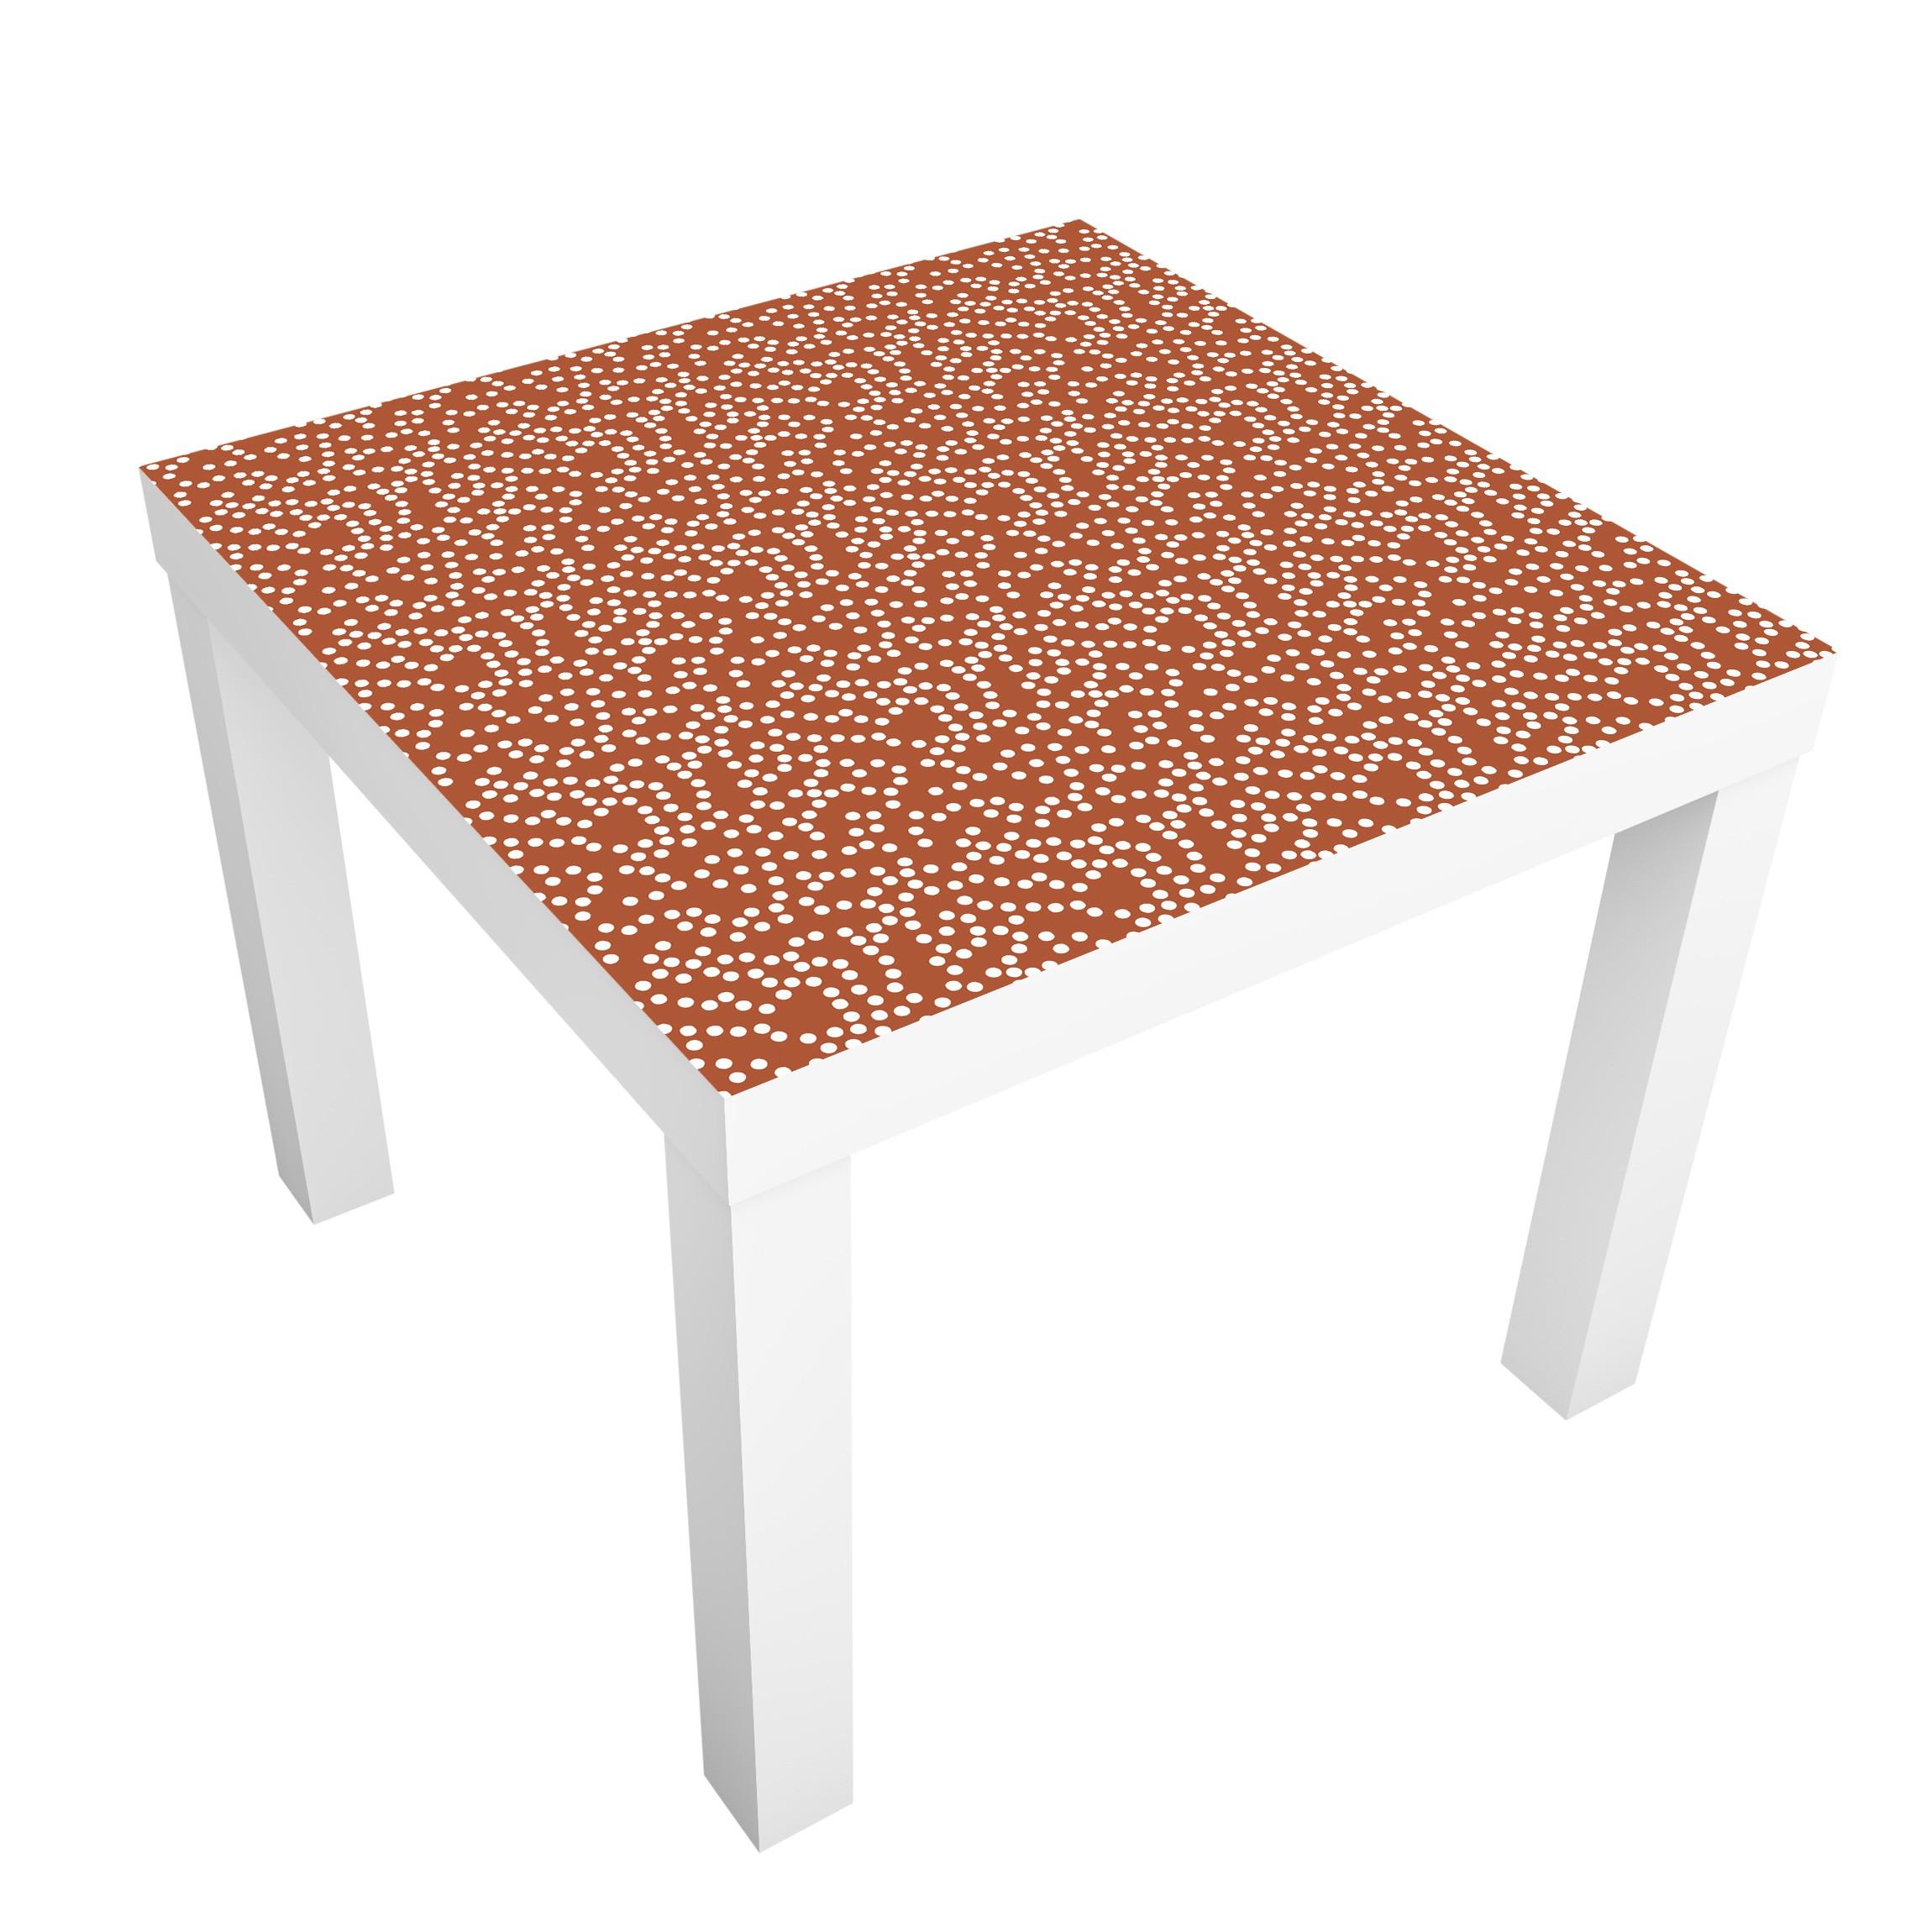 Carta adesiva per mobili ikea lack tavolino aboriginal dot pattern brown - Lack tavolino ikea ...